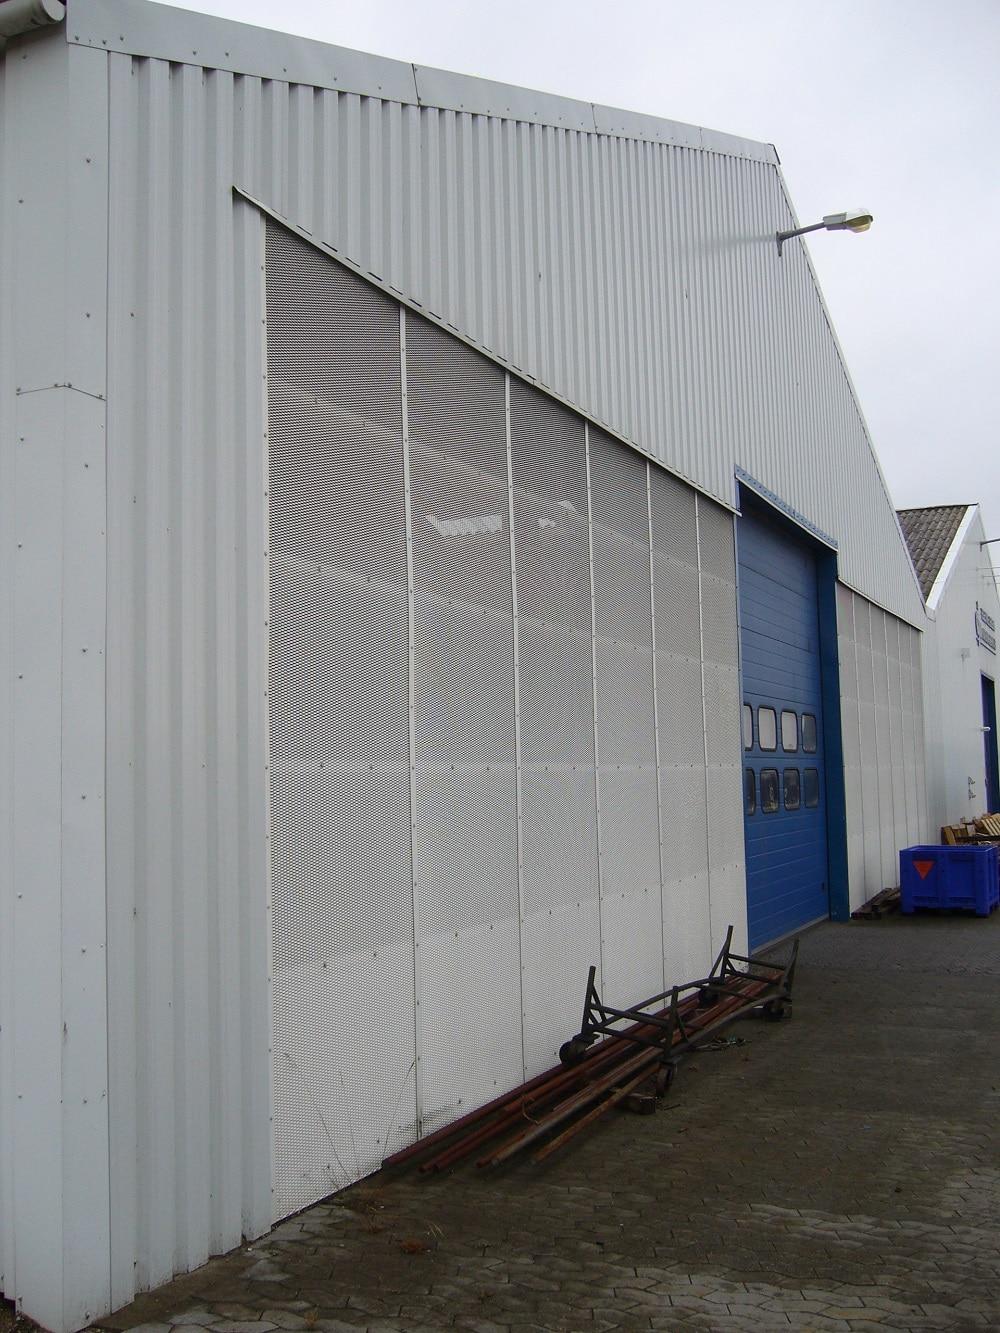 Facade, Strækmetal, Facadebeklædning i metal, stål facader, beklædning, facader, metal, metal facade